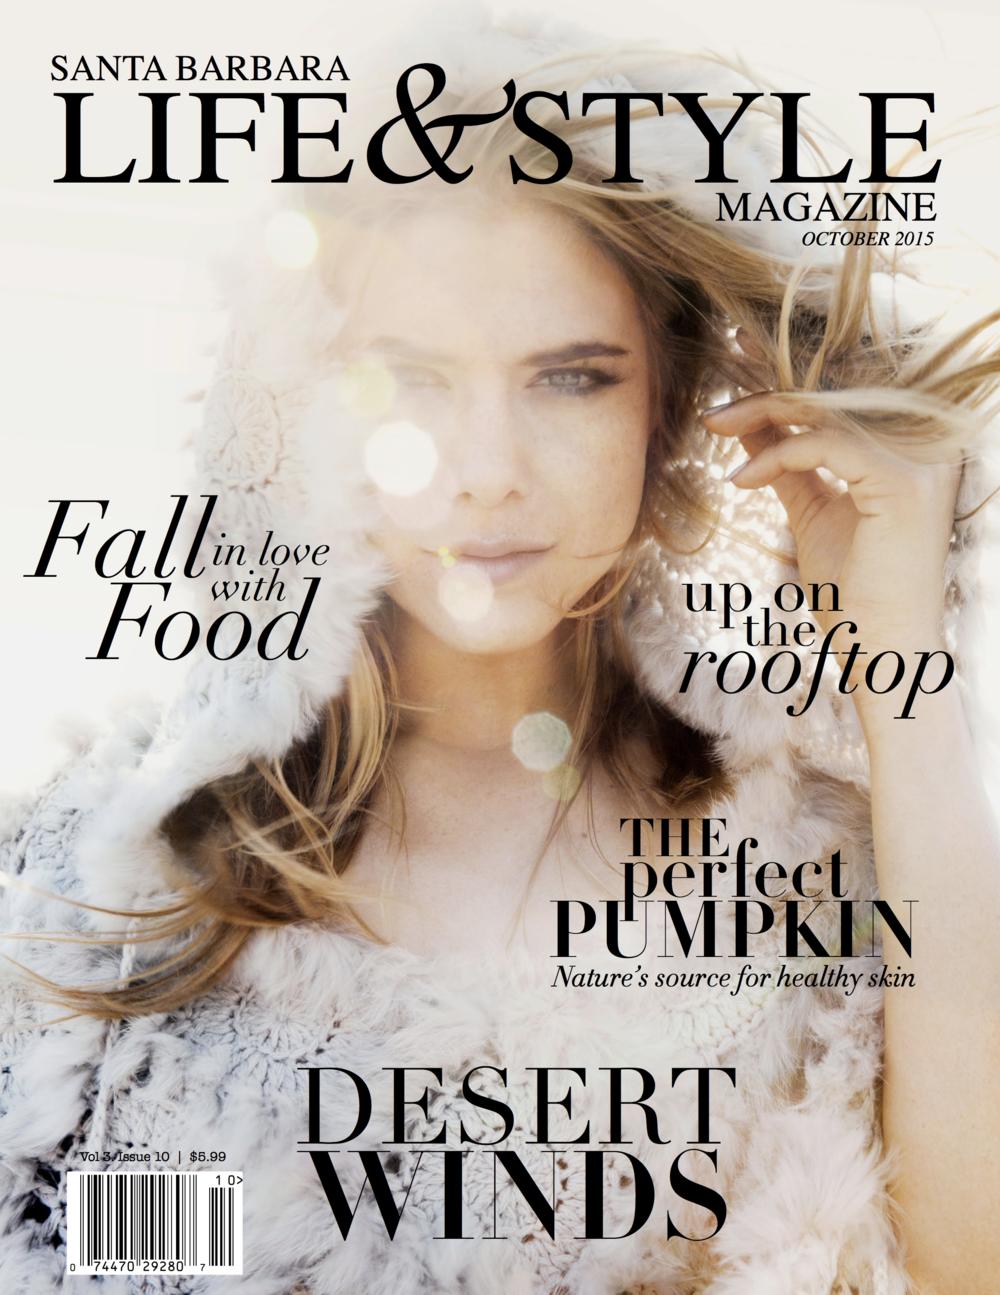 Santa Barbara Life & Style Magazine